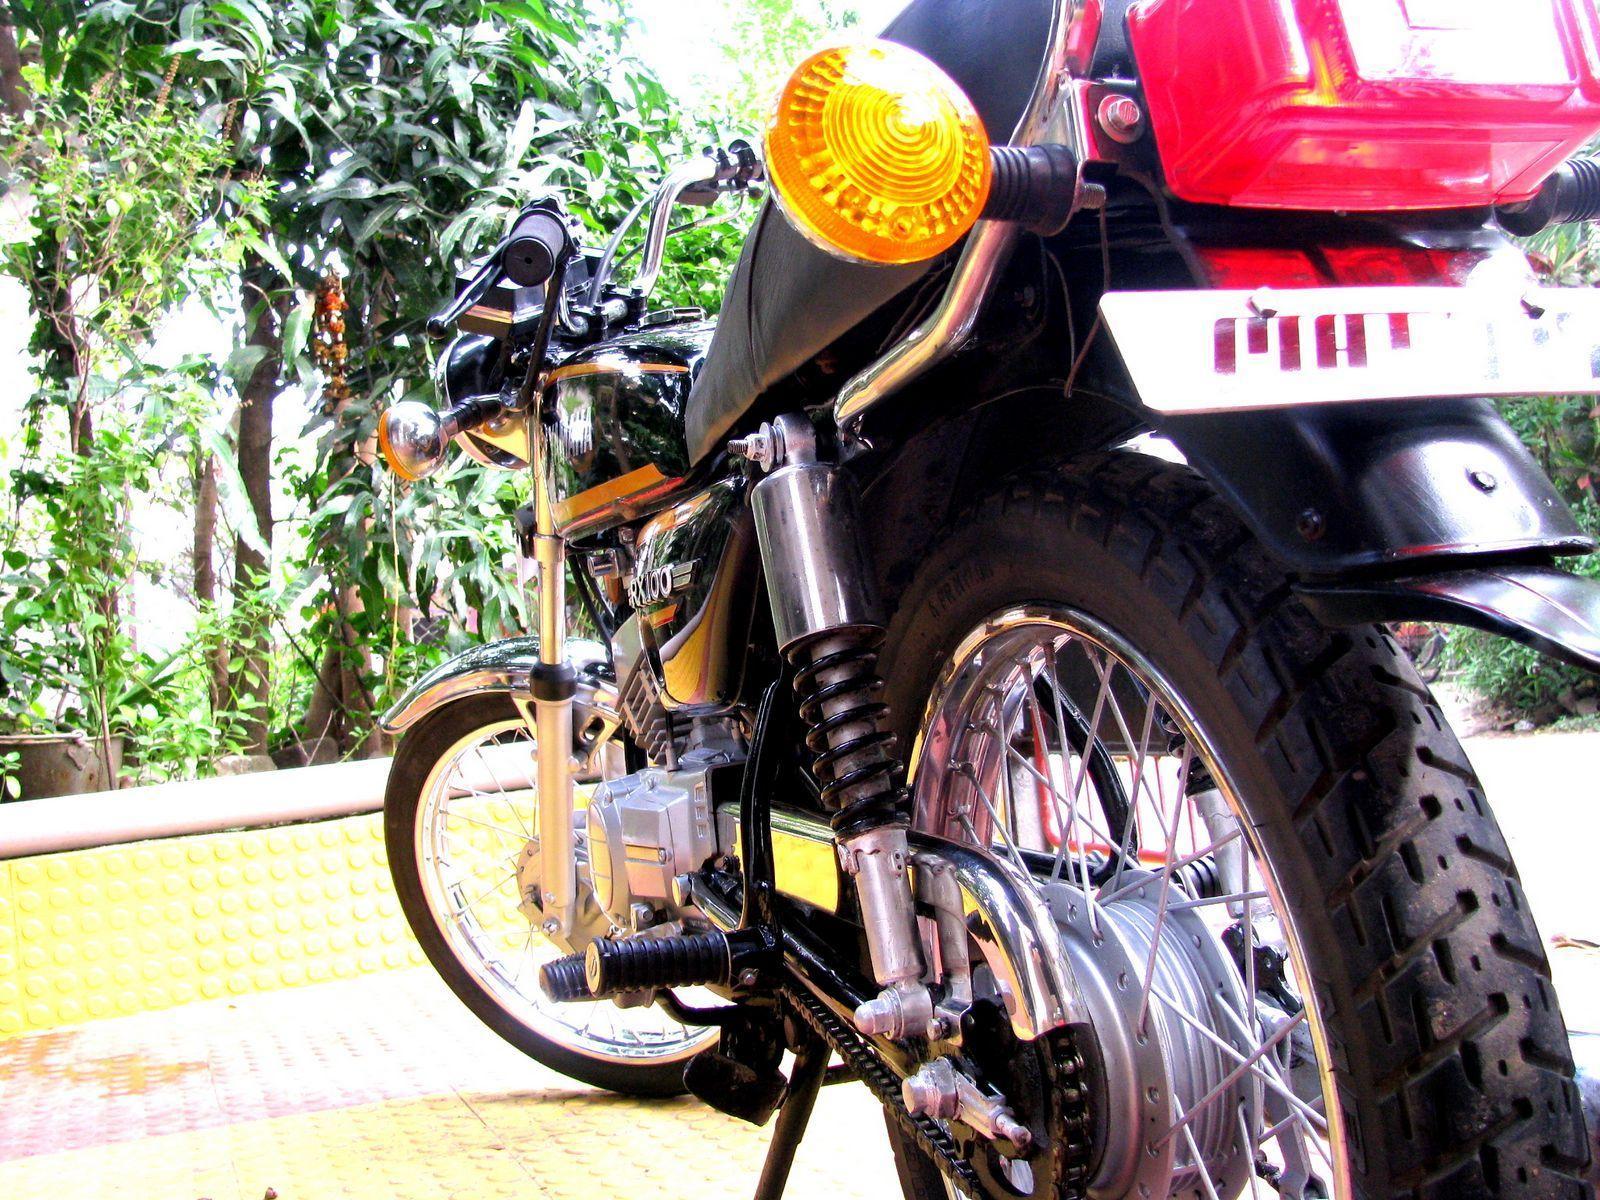 Yamaha RX 100 Wallpapers